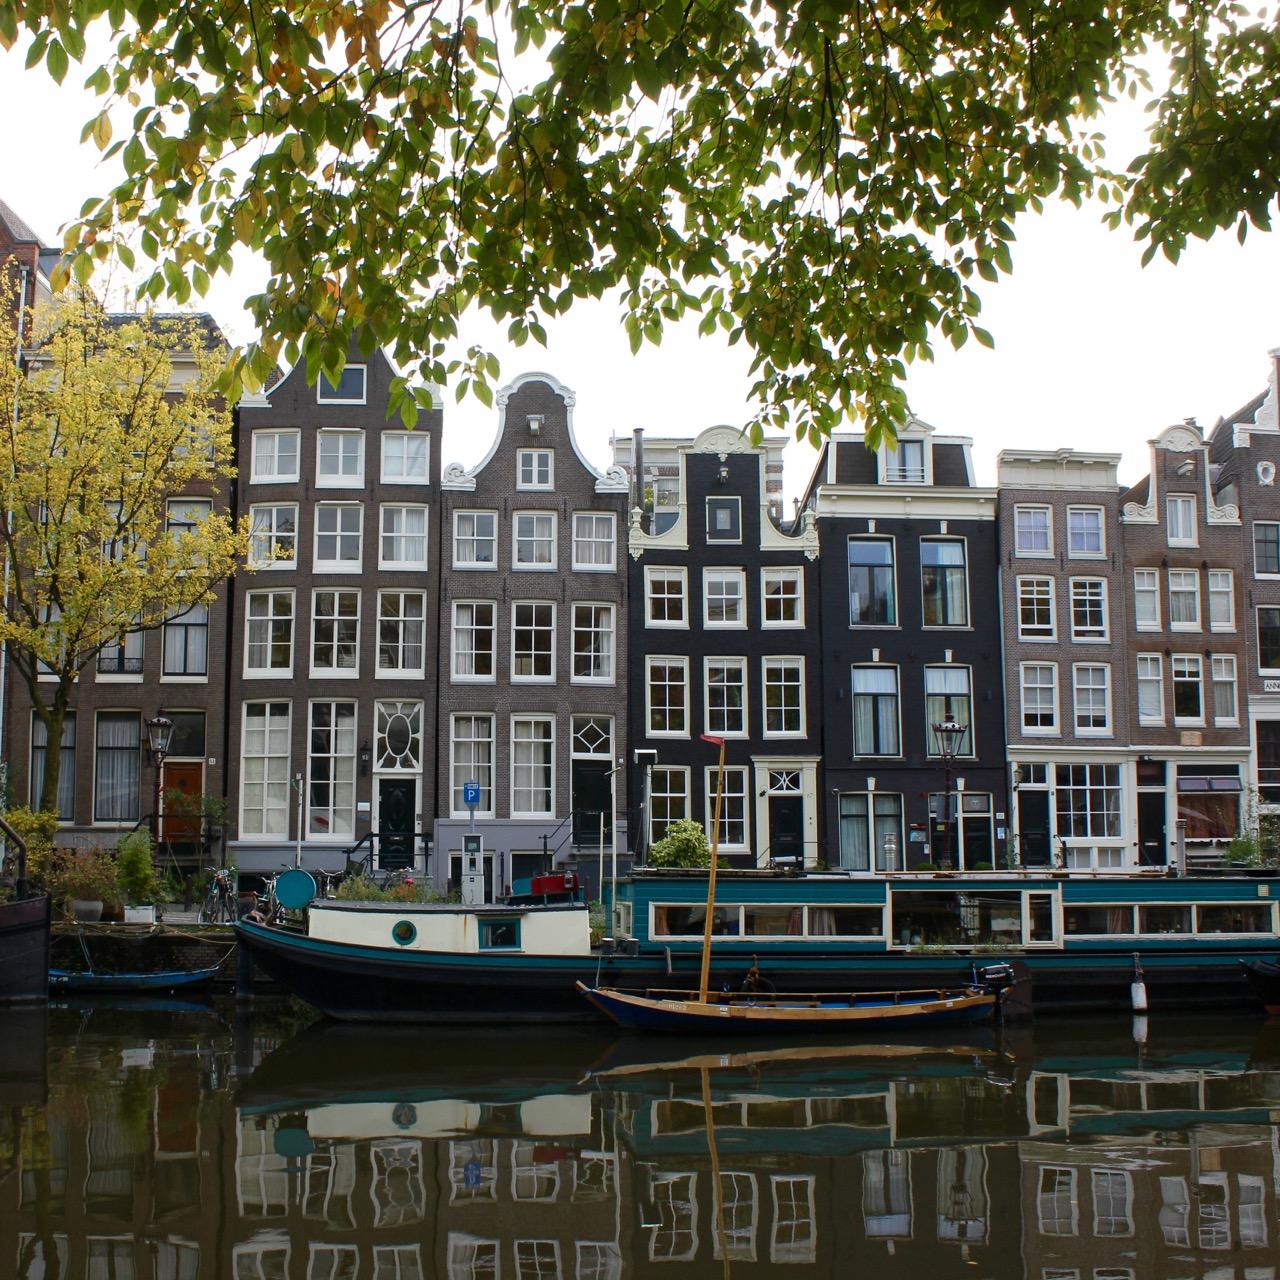 Amsterdam, Netherlands - 2